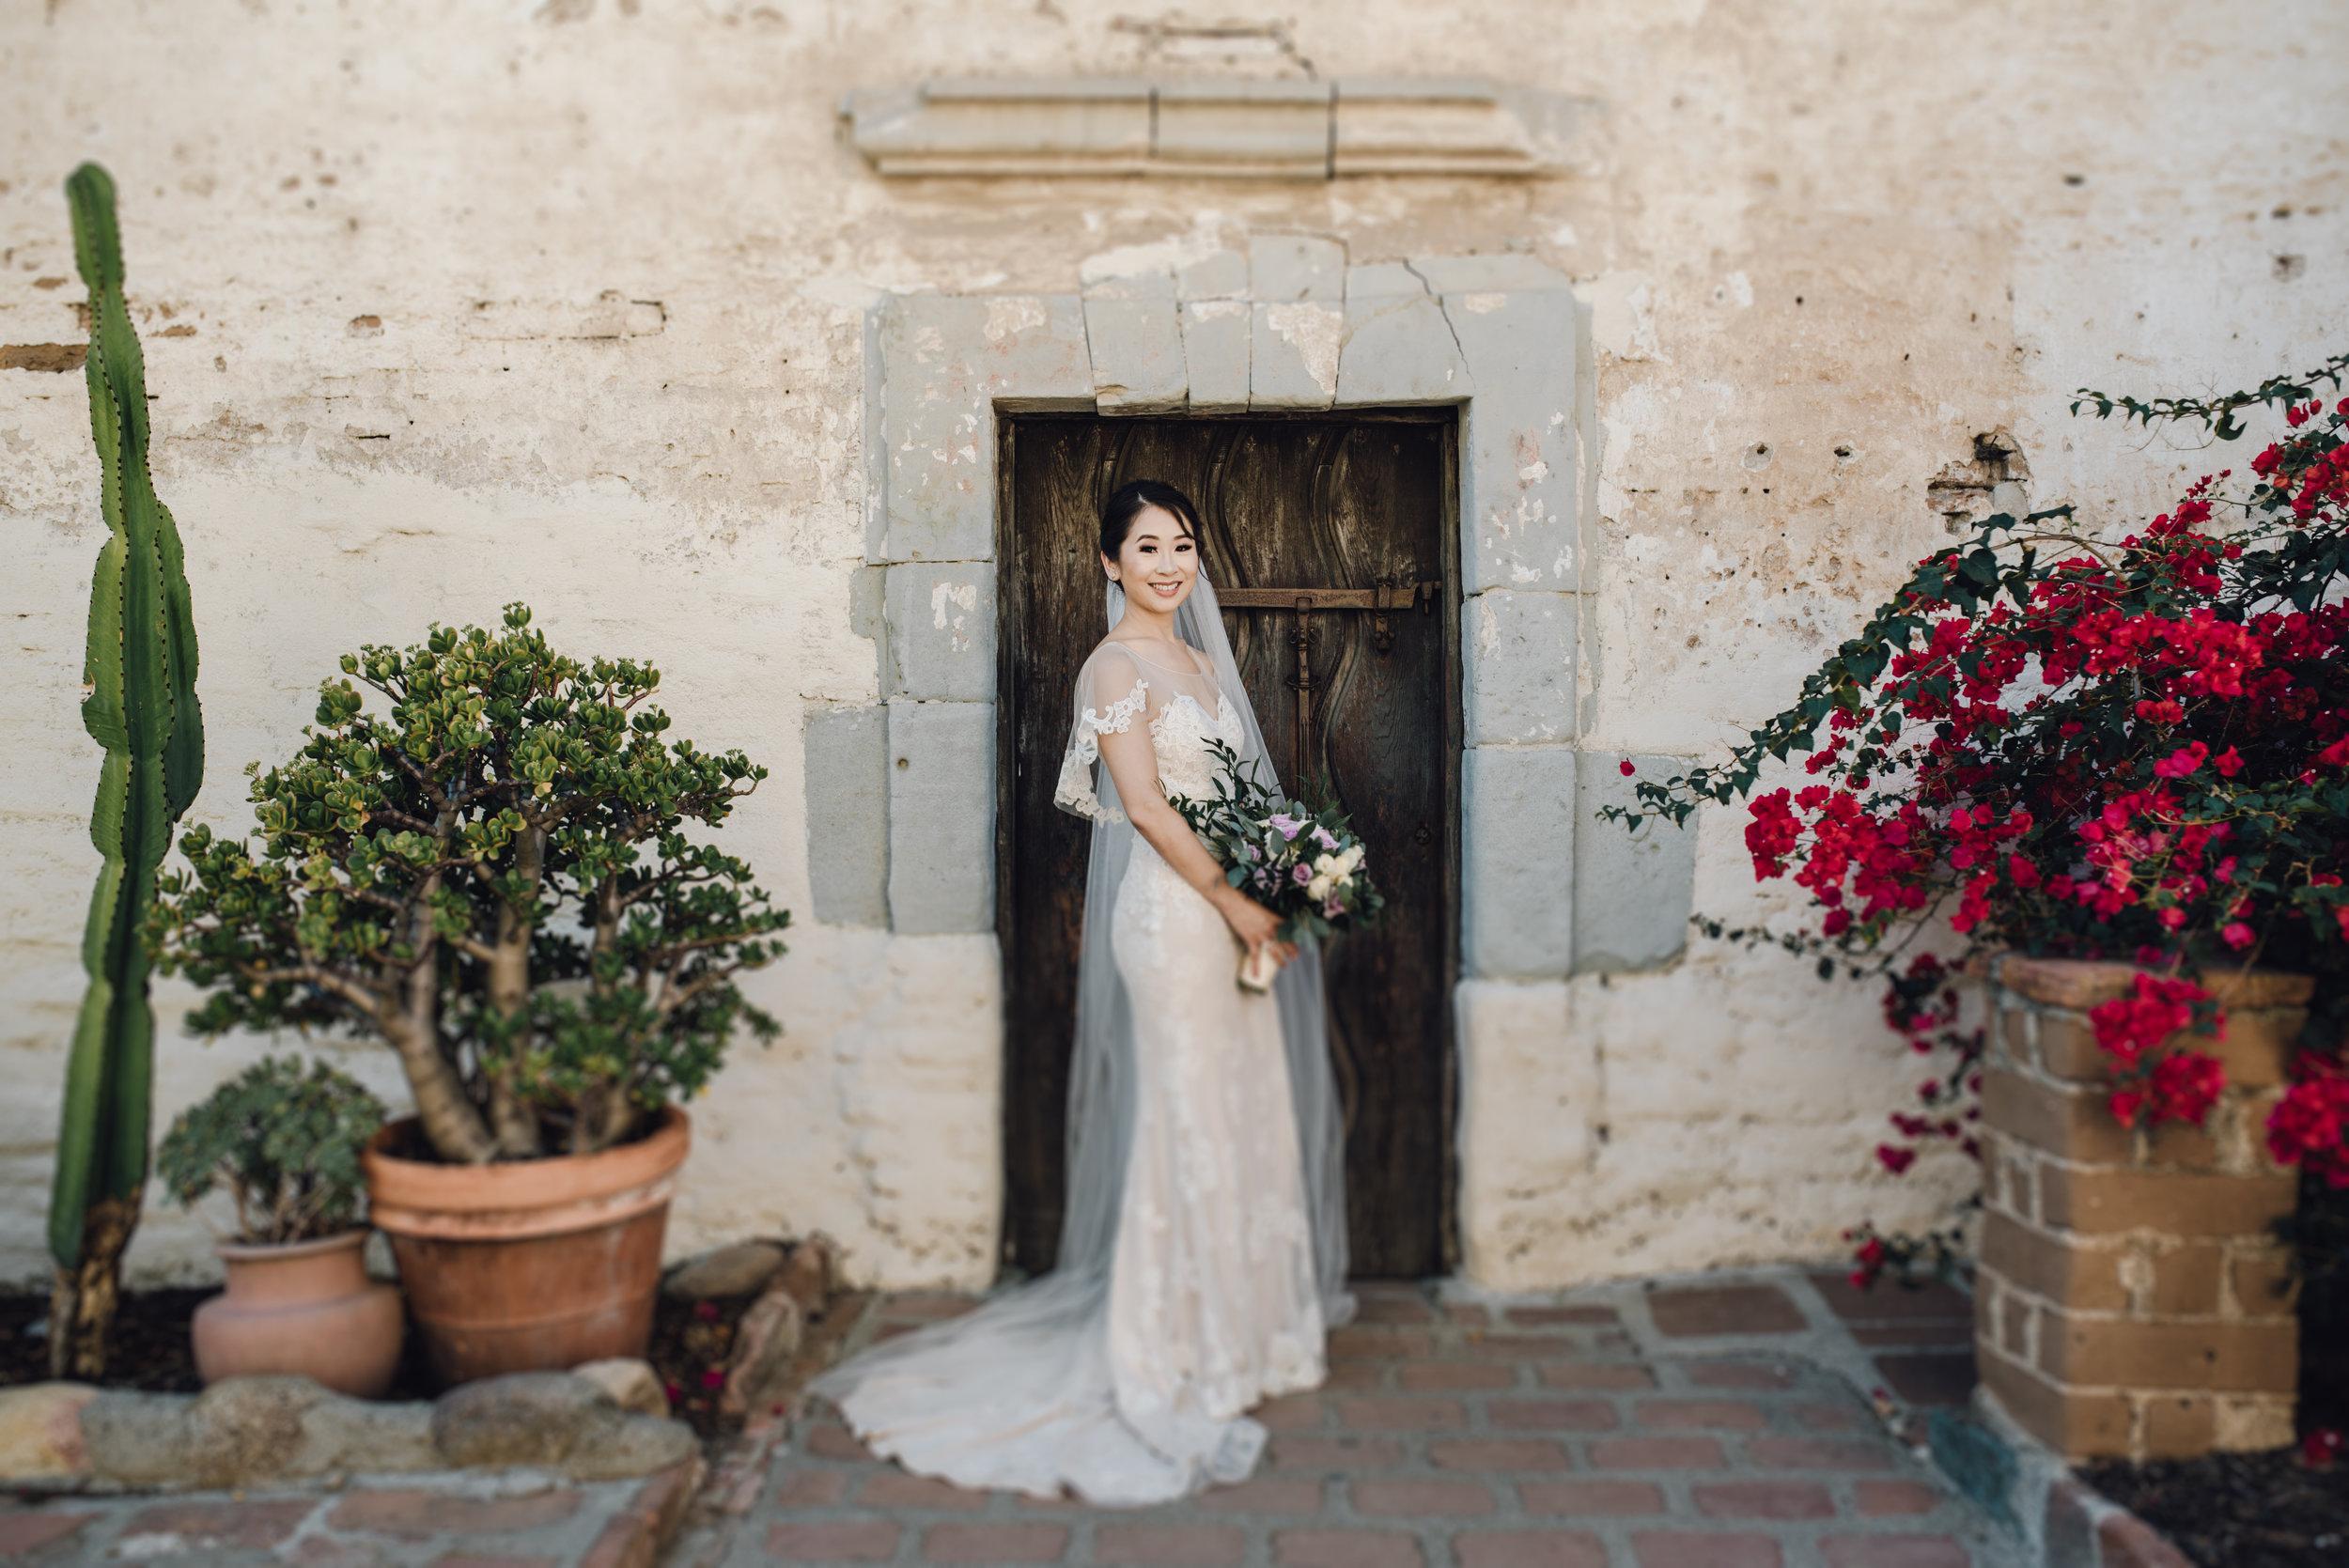 Main and Simple Photography_2017_Weddings_SanJuanCapistrano_J+B-454.jpg